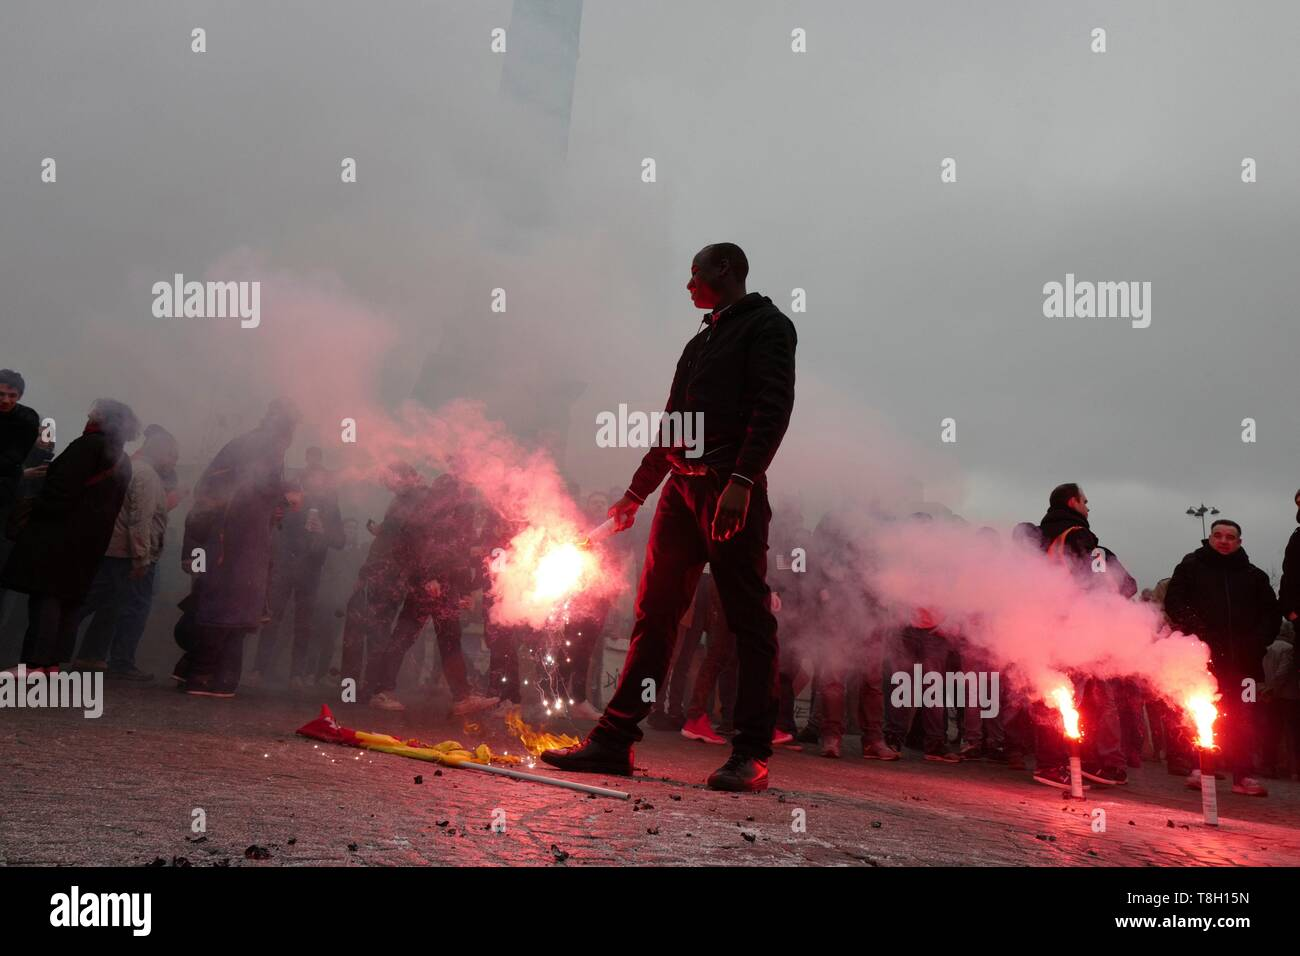 France, Paris, Rally place de la Bastille, Smoke bombs - Stock Image